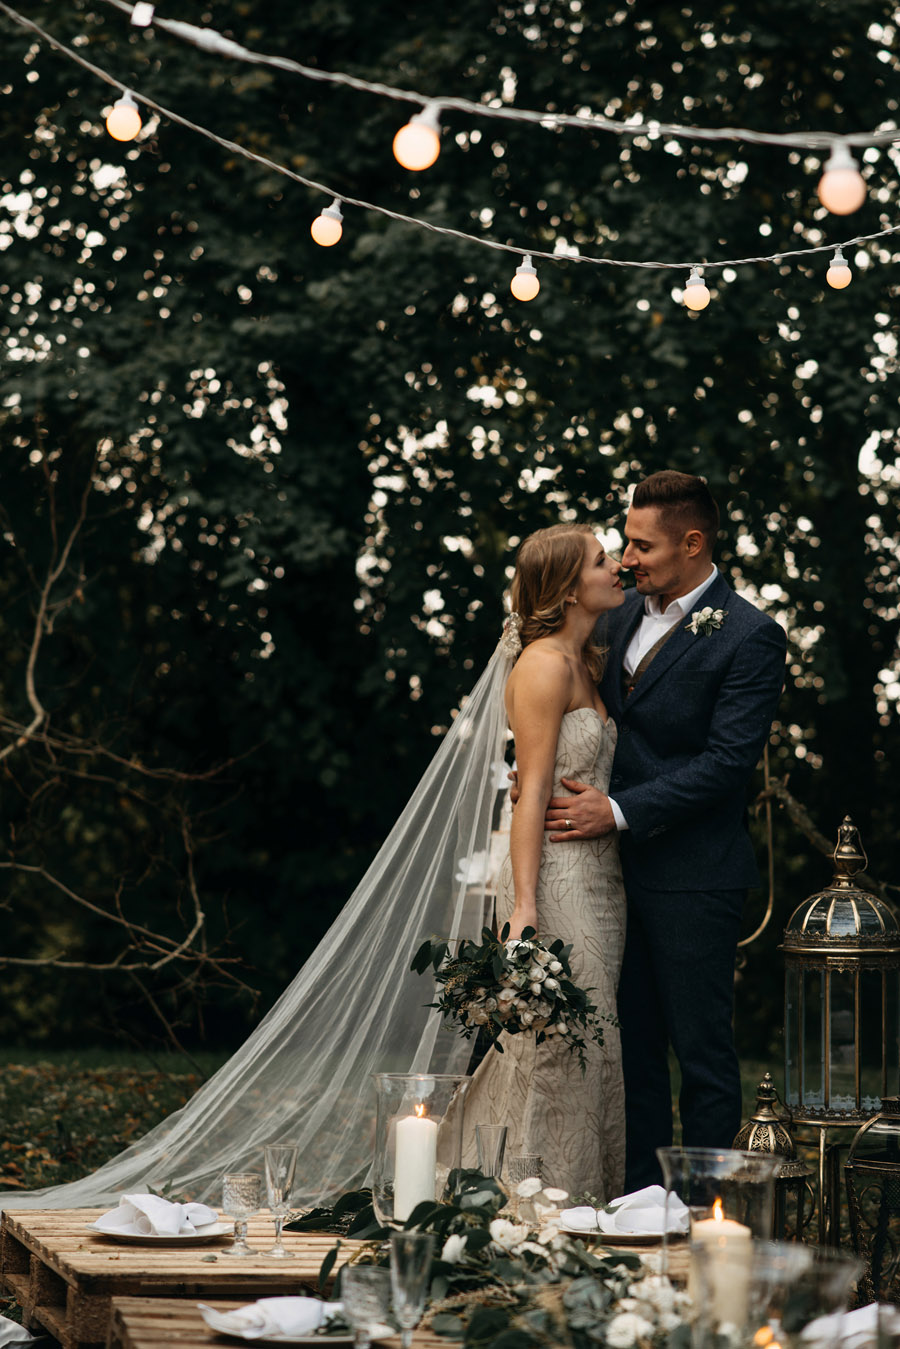 Eco vegan wedding style inspiration with Sanyukta Shrestha, credit KMGS Photography (17)